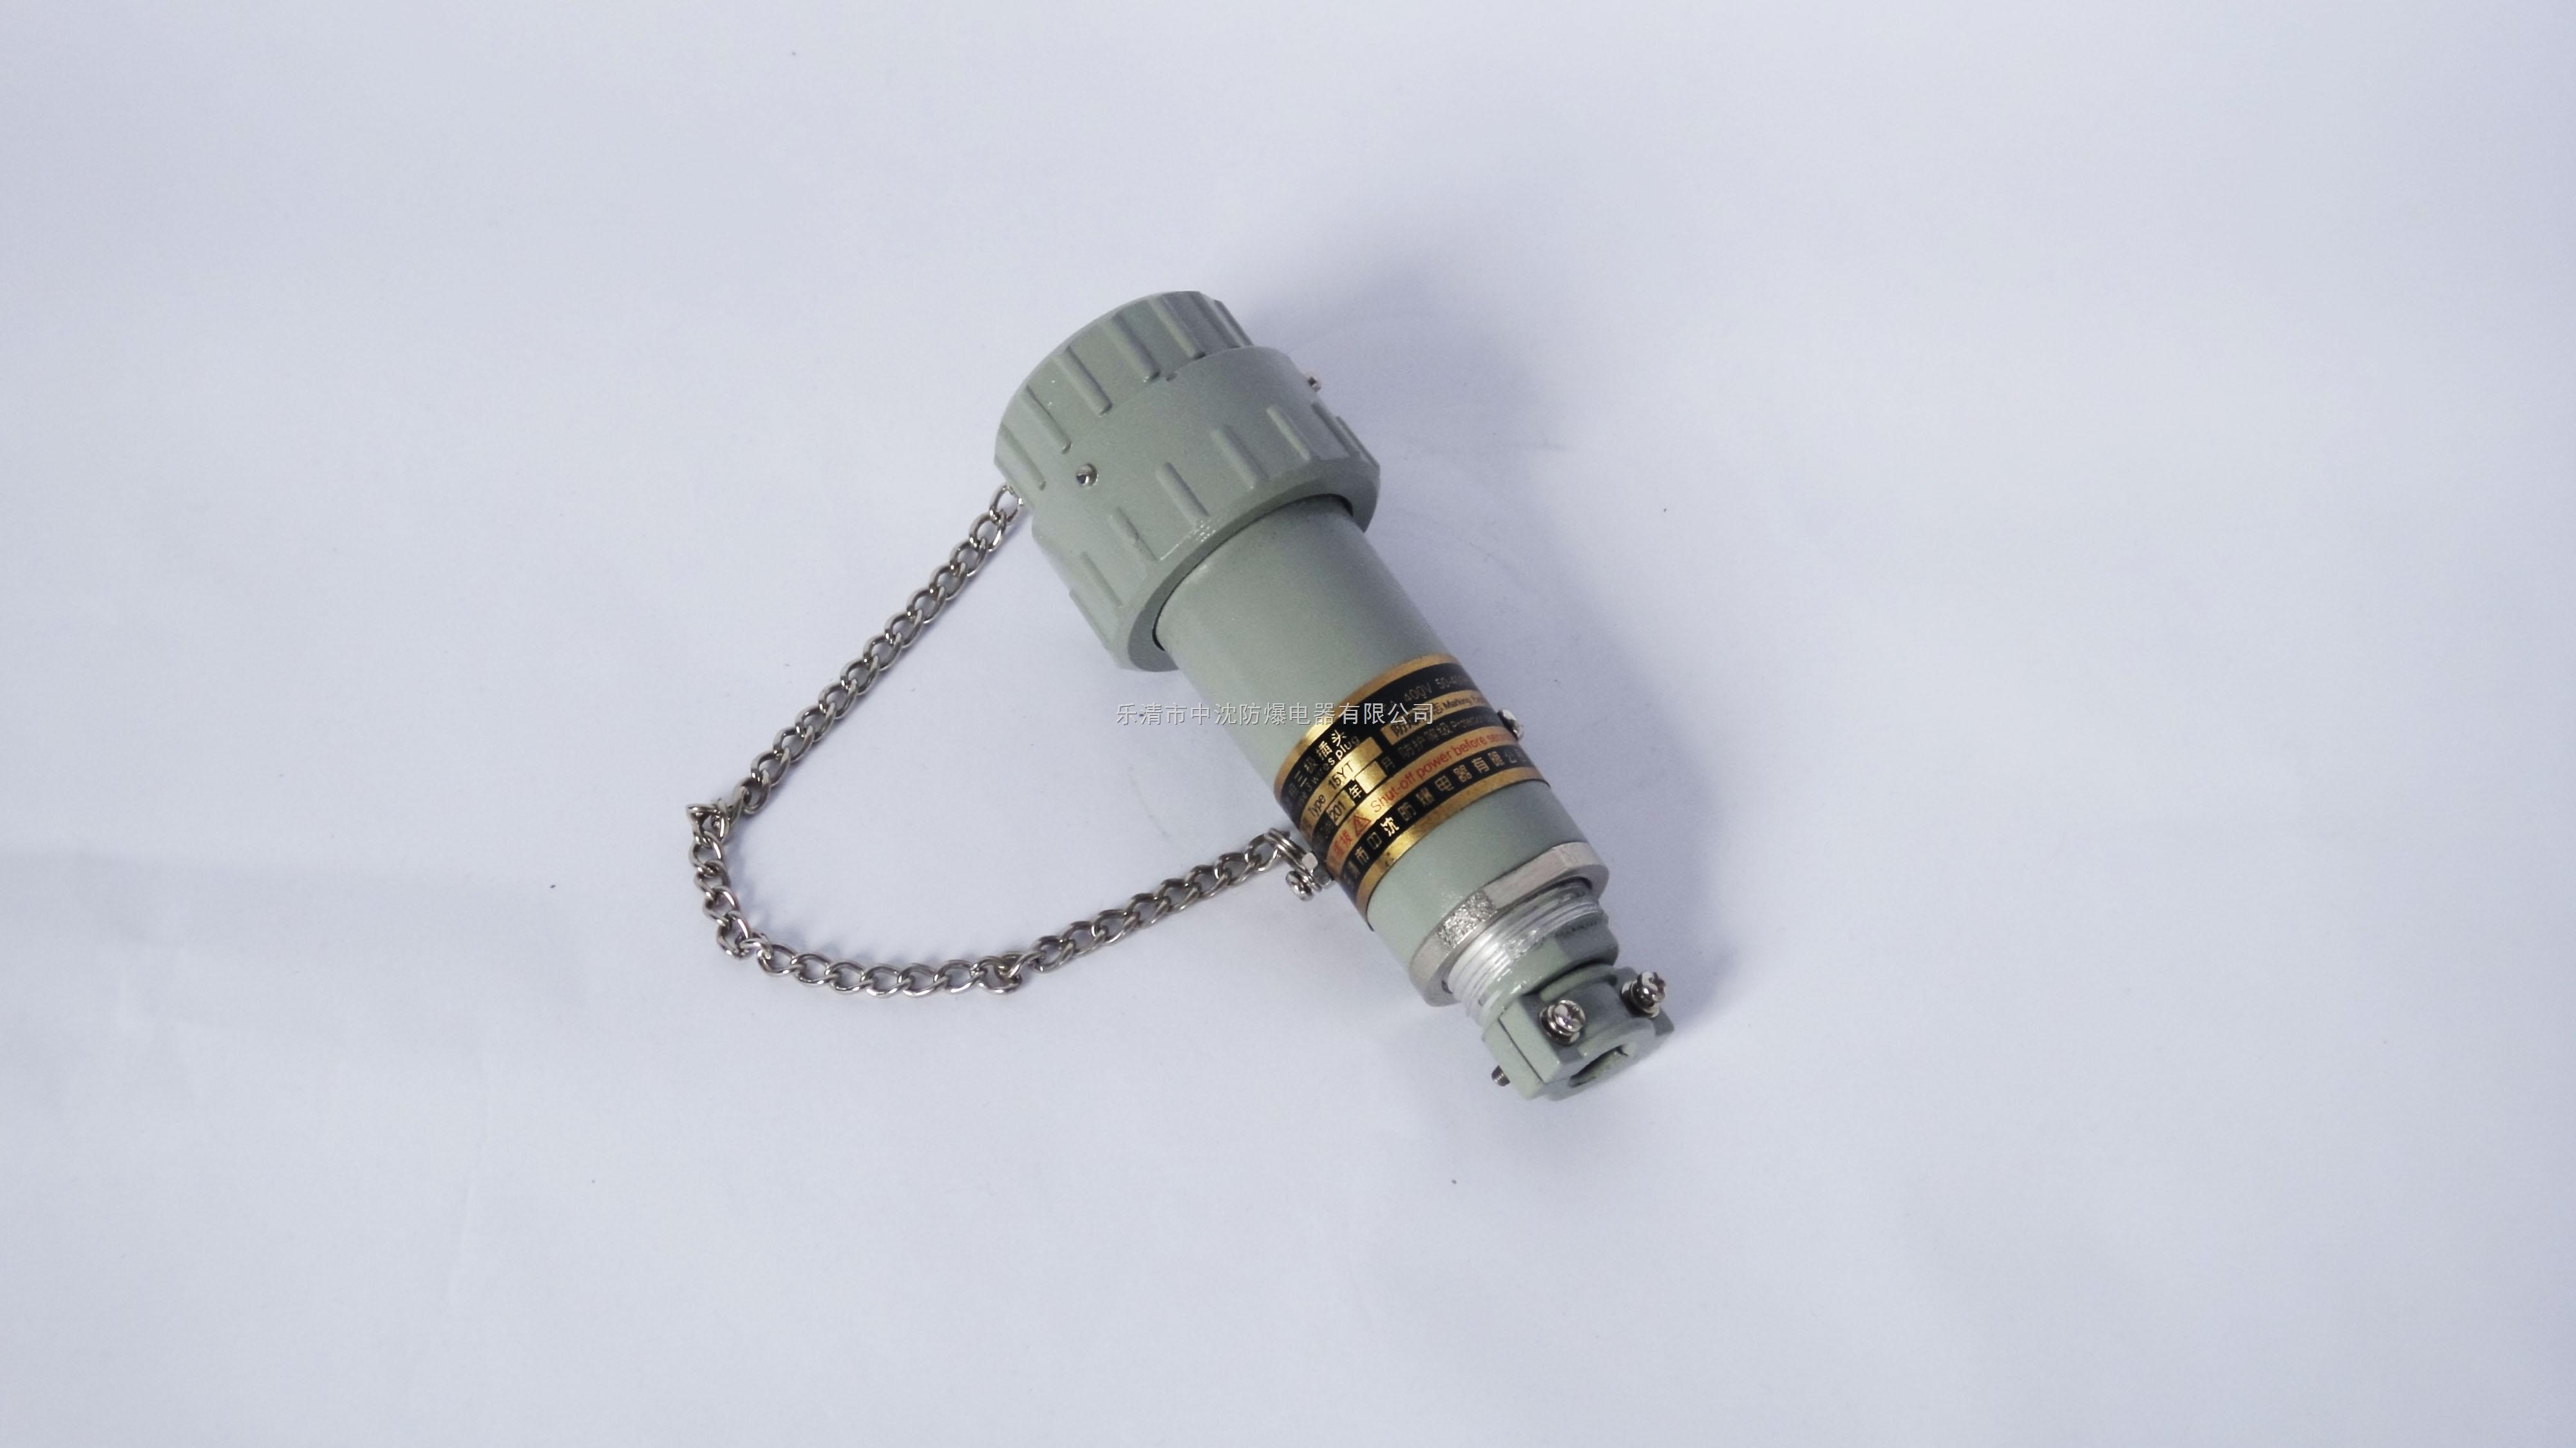 YT/GZ/YZ-无火花型防爆电连接器 插头插座三相四级15A到300A